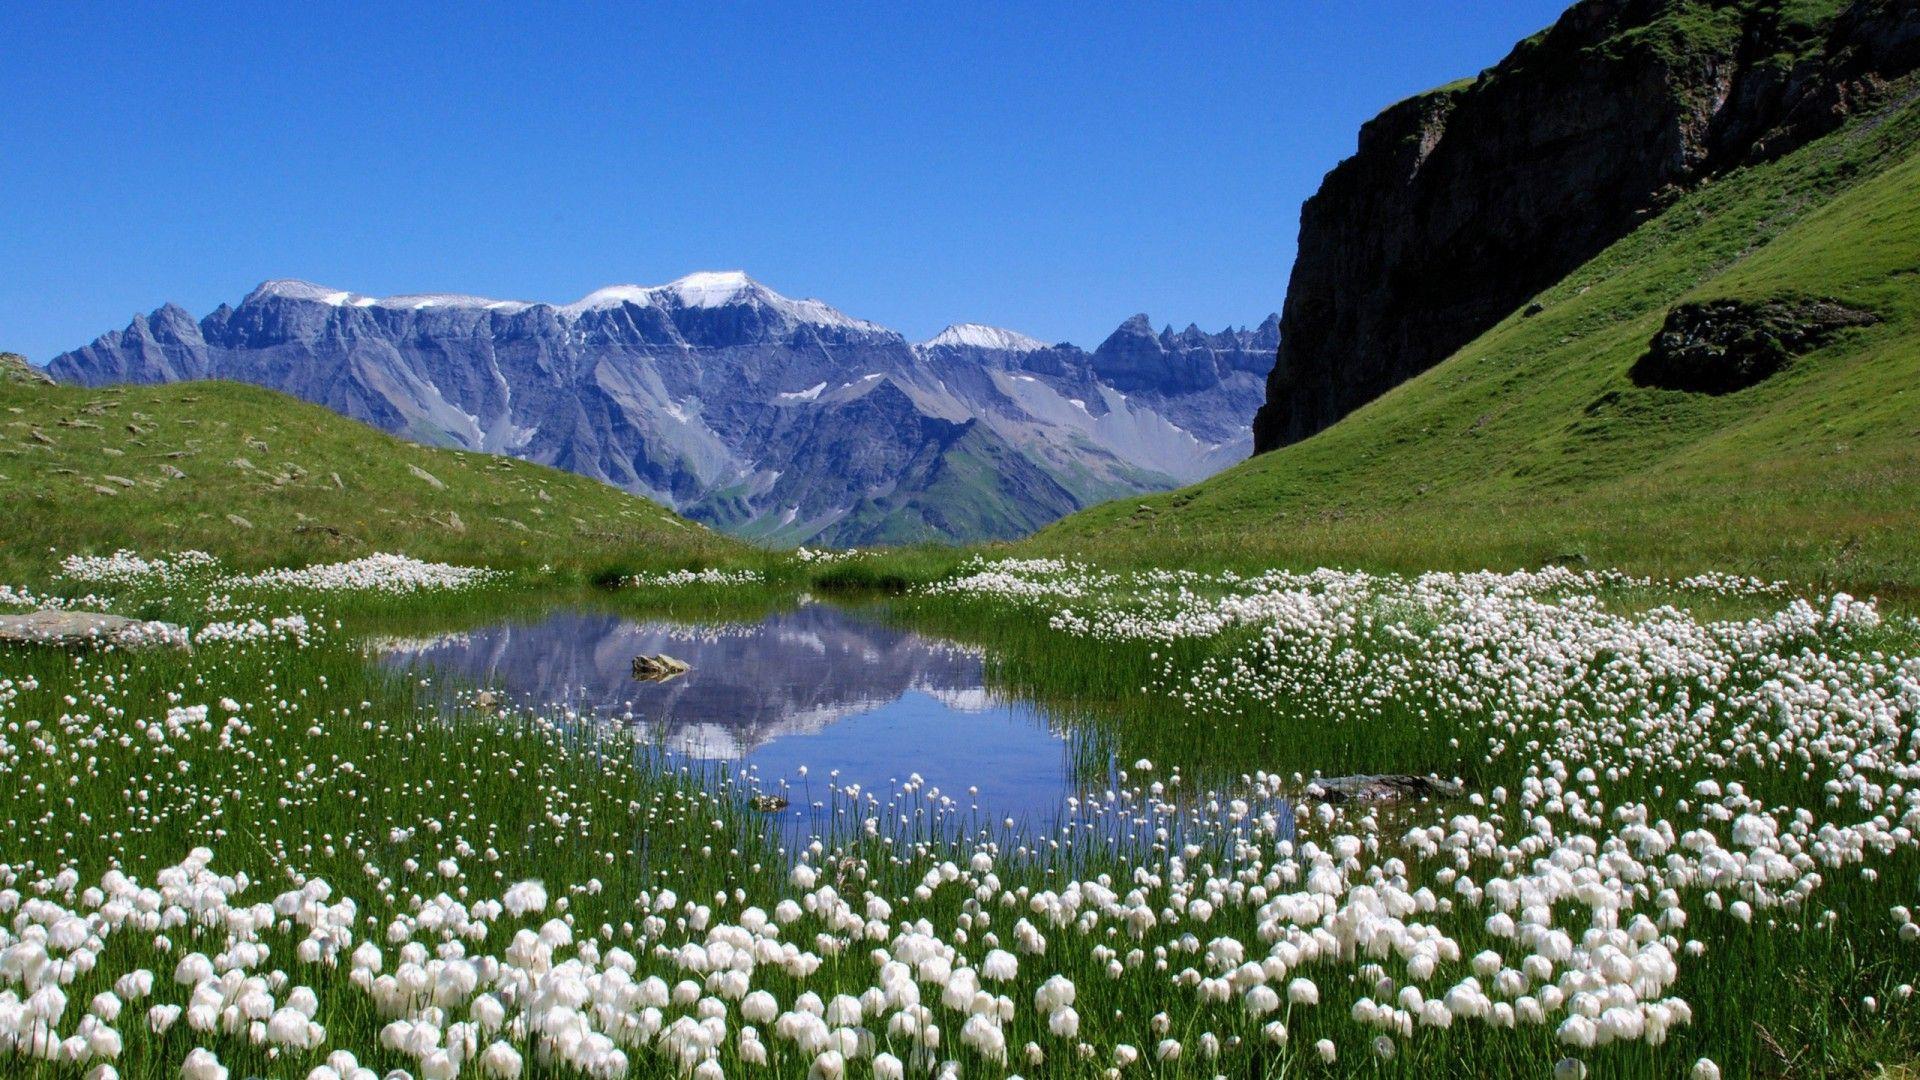 Oma Wathen Top Hd Swiss Wallpapers Hdq Beautiful Nature Spring Beautiful Nature Mountains